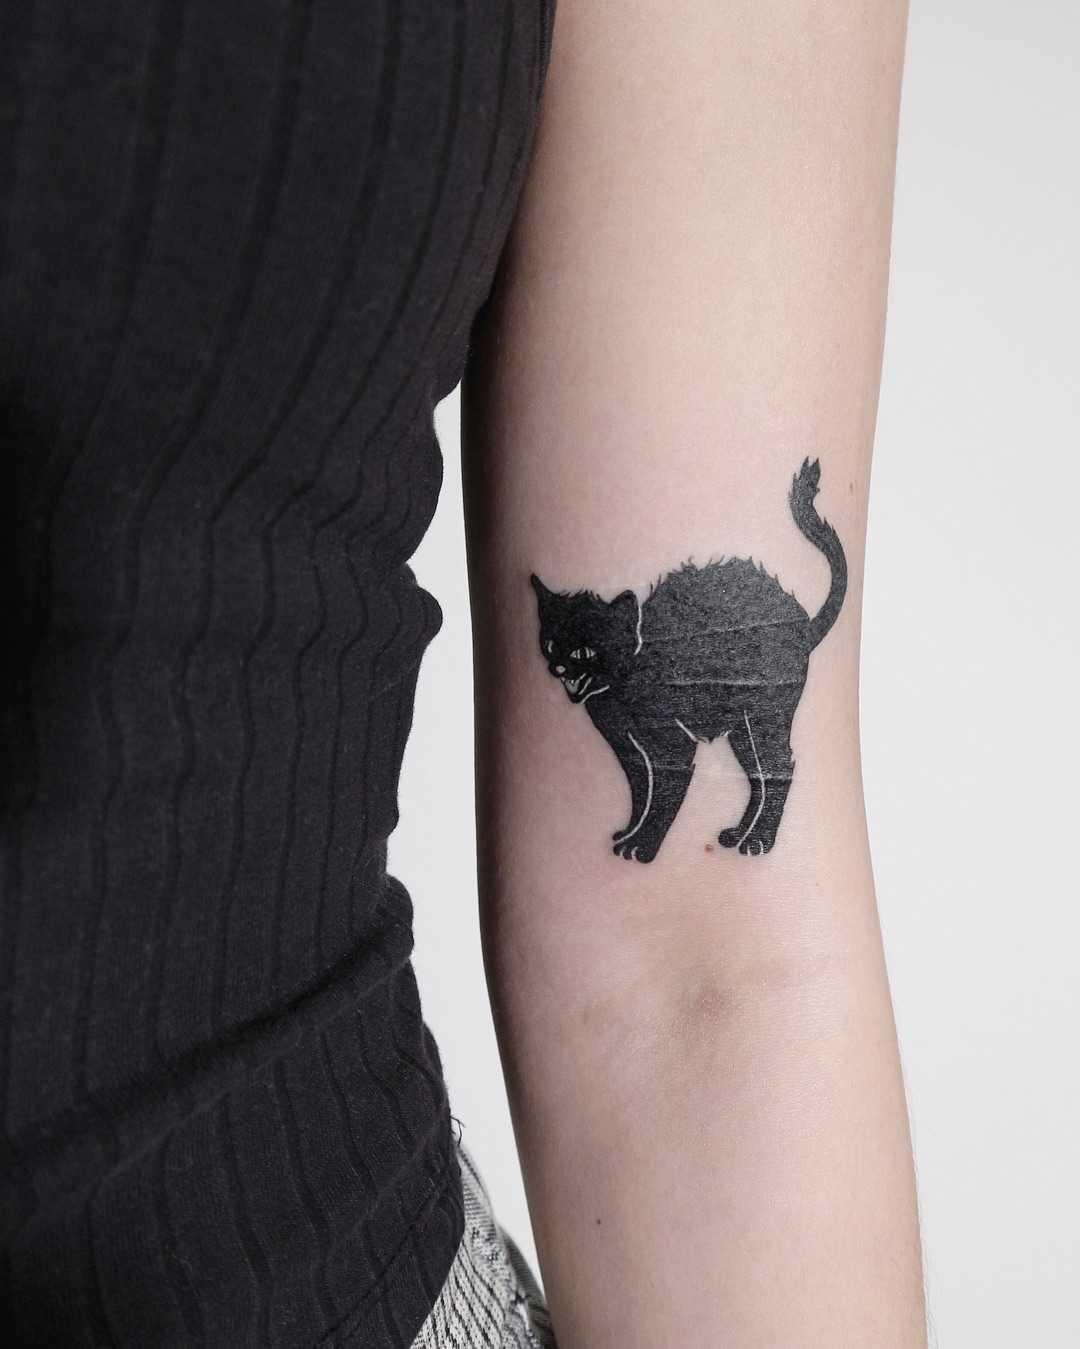 Black cat tattoo by Ann Gilberg